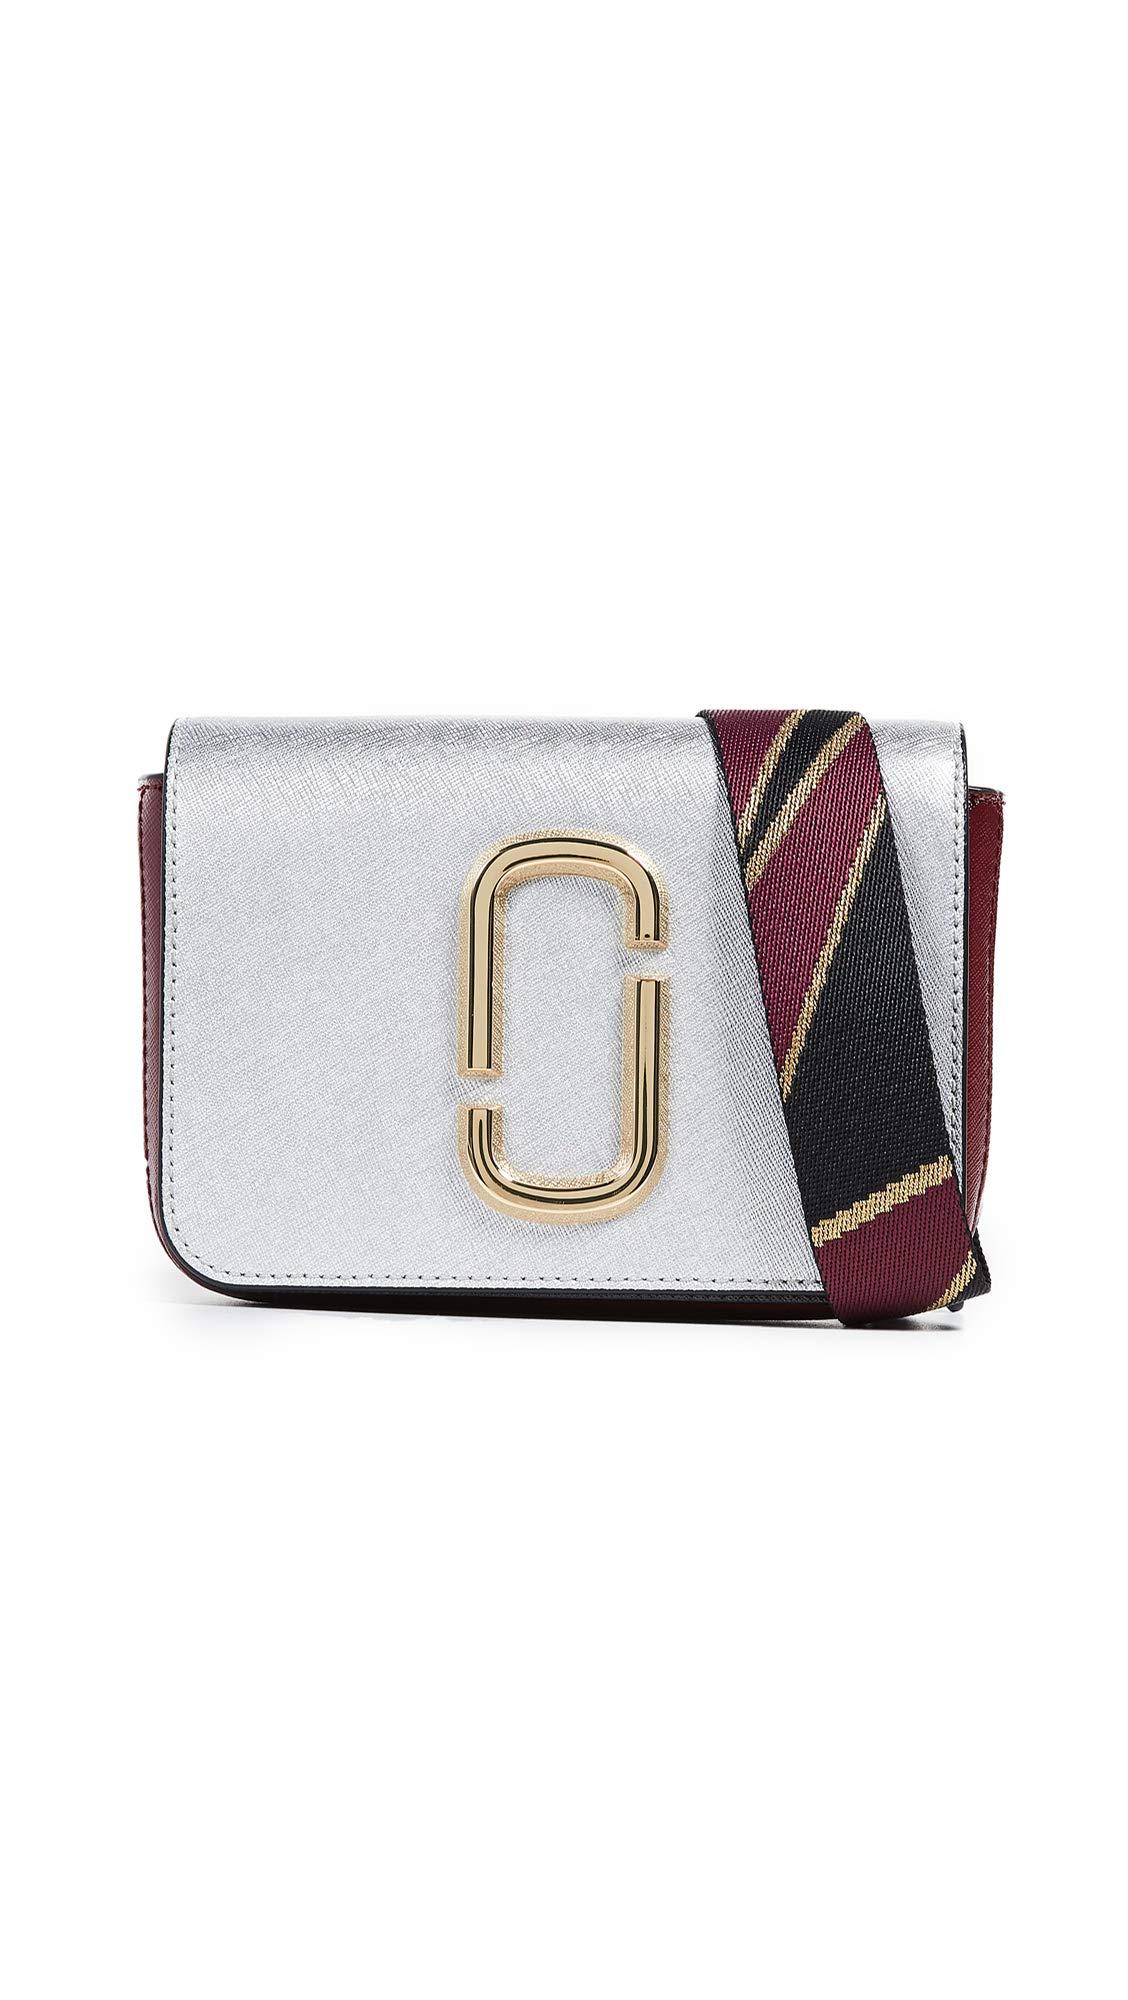 Marc Jacobs Women's M/L Hip Shot Convertible Belt Bag, Silver, One Size